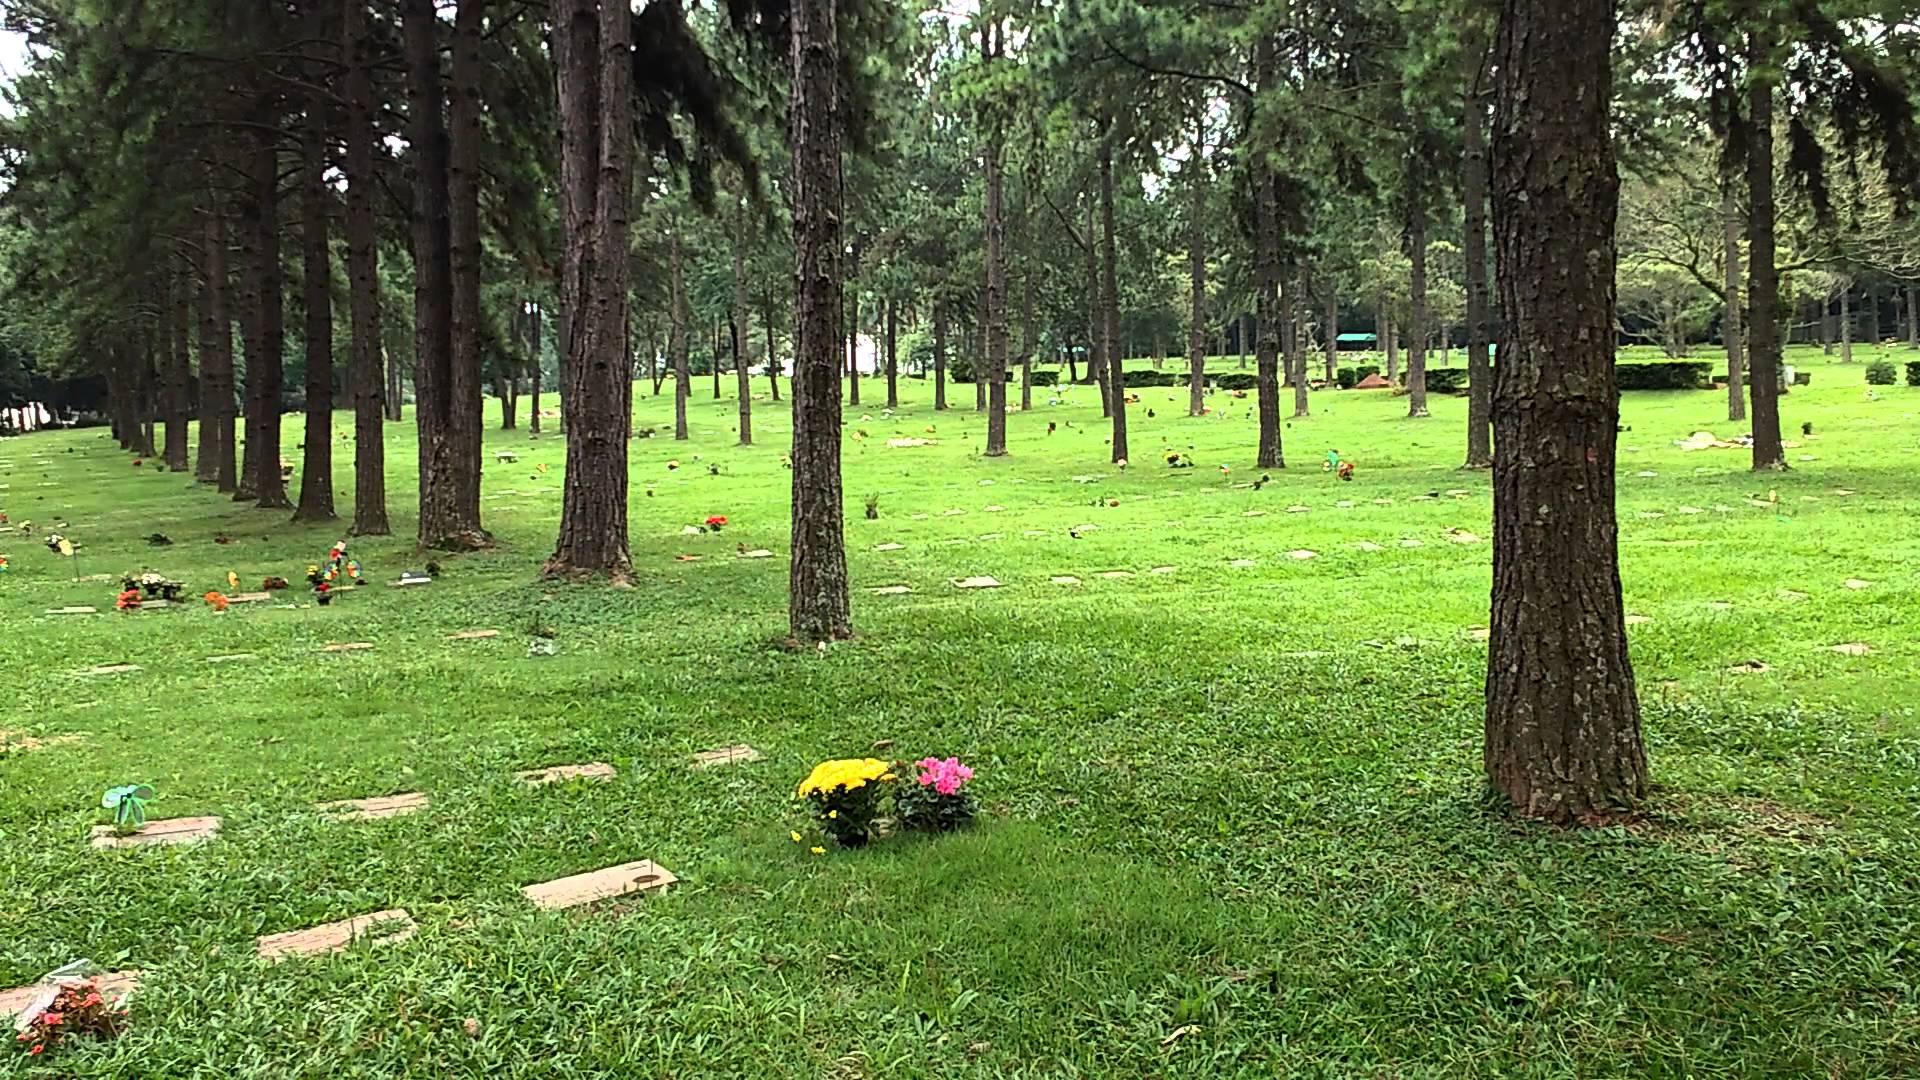 Cemitério Jardim da Colina   Coroas 24 Horas Curitiba